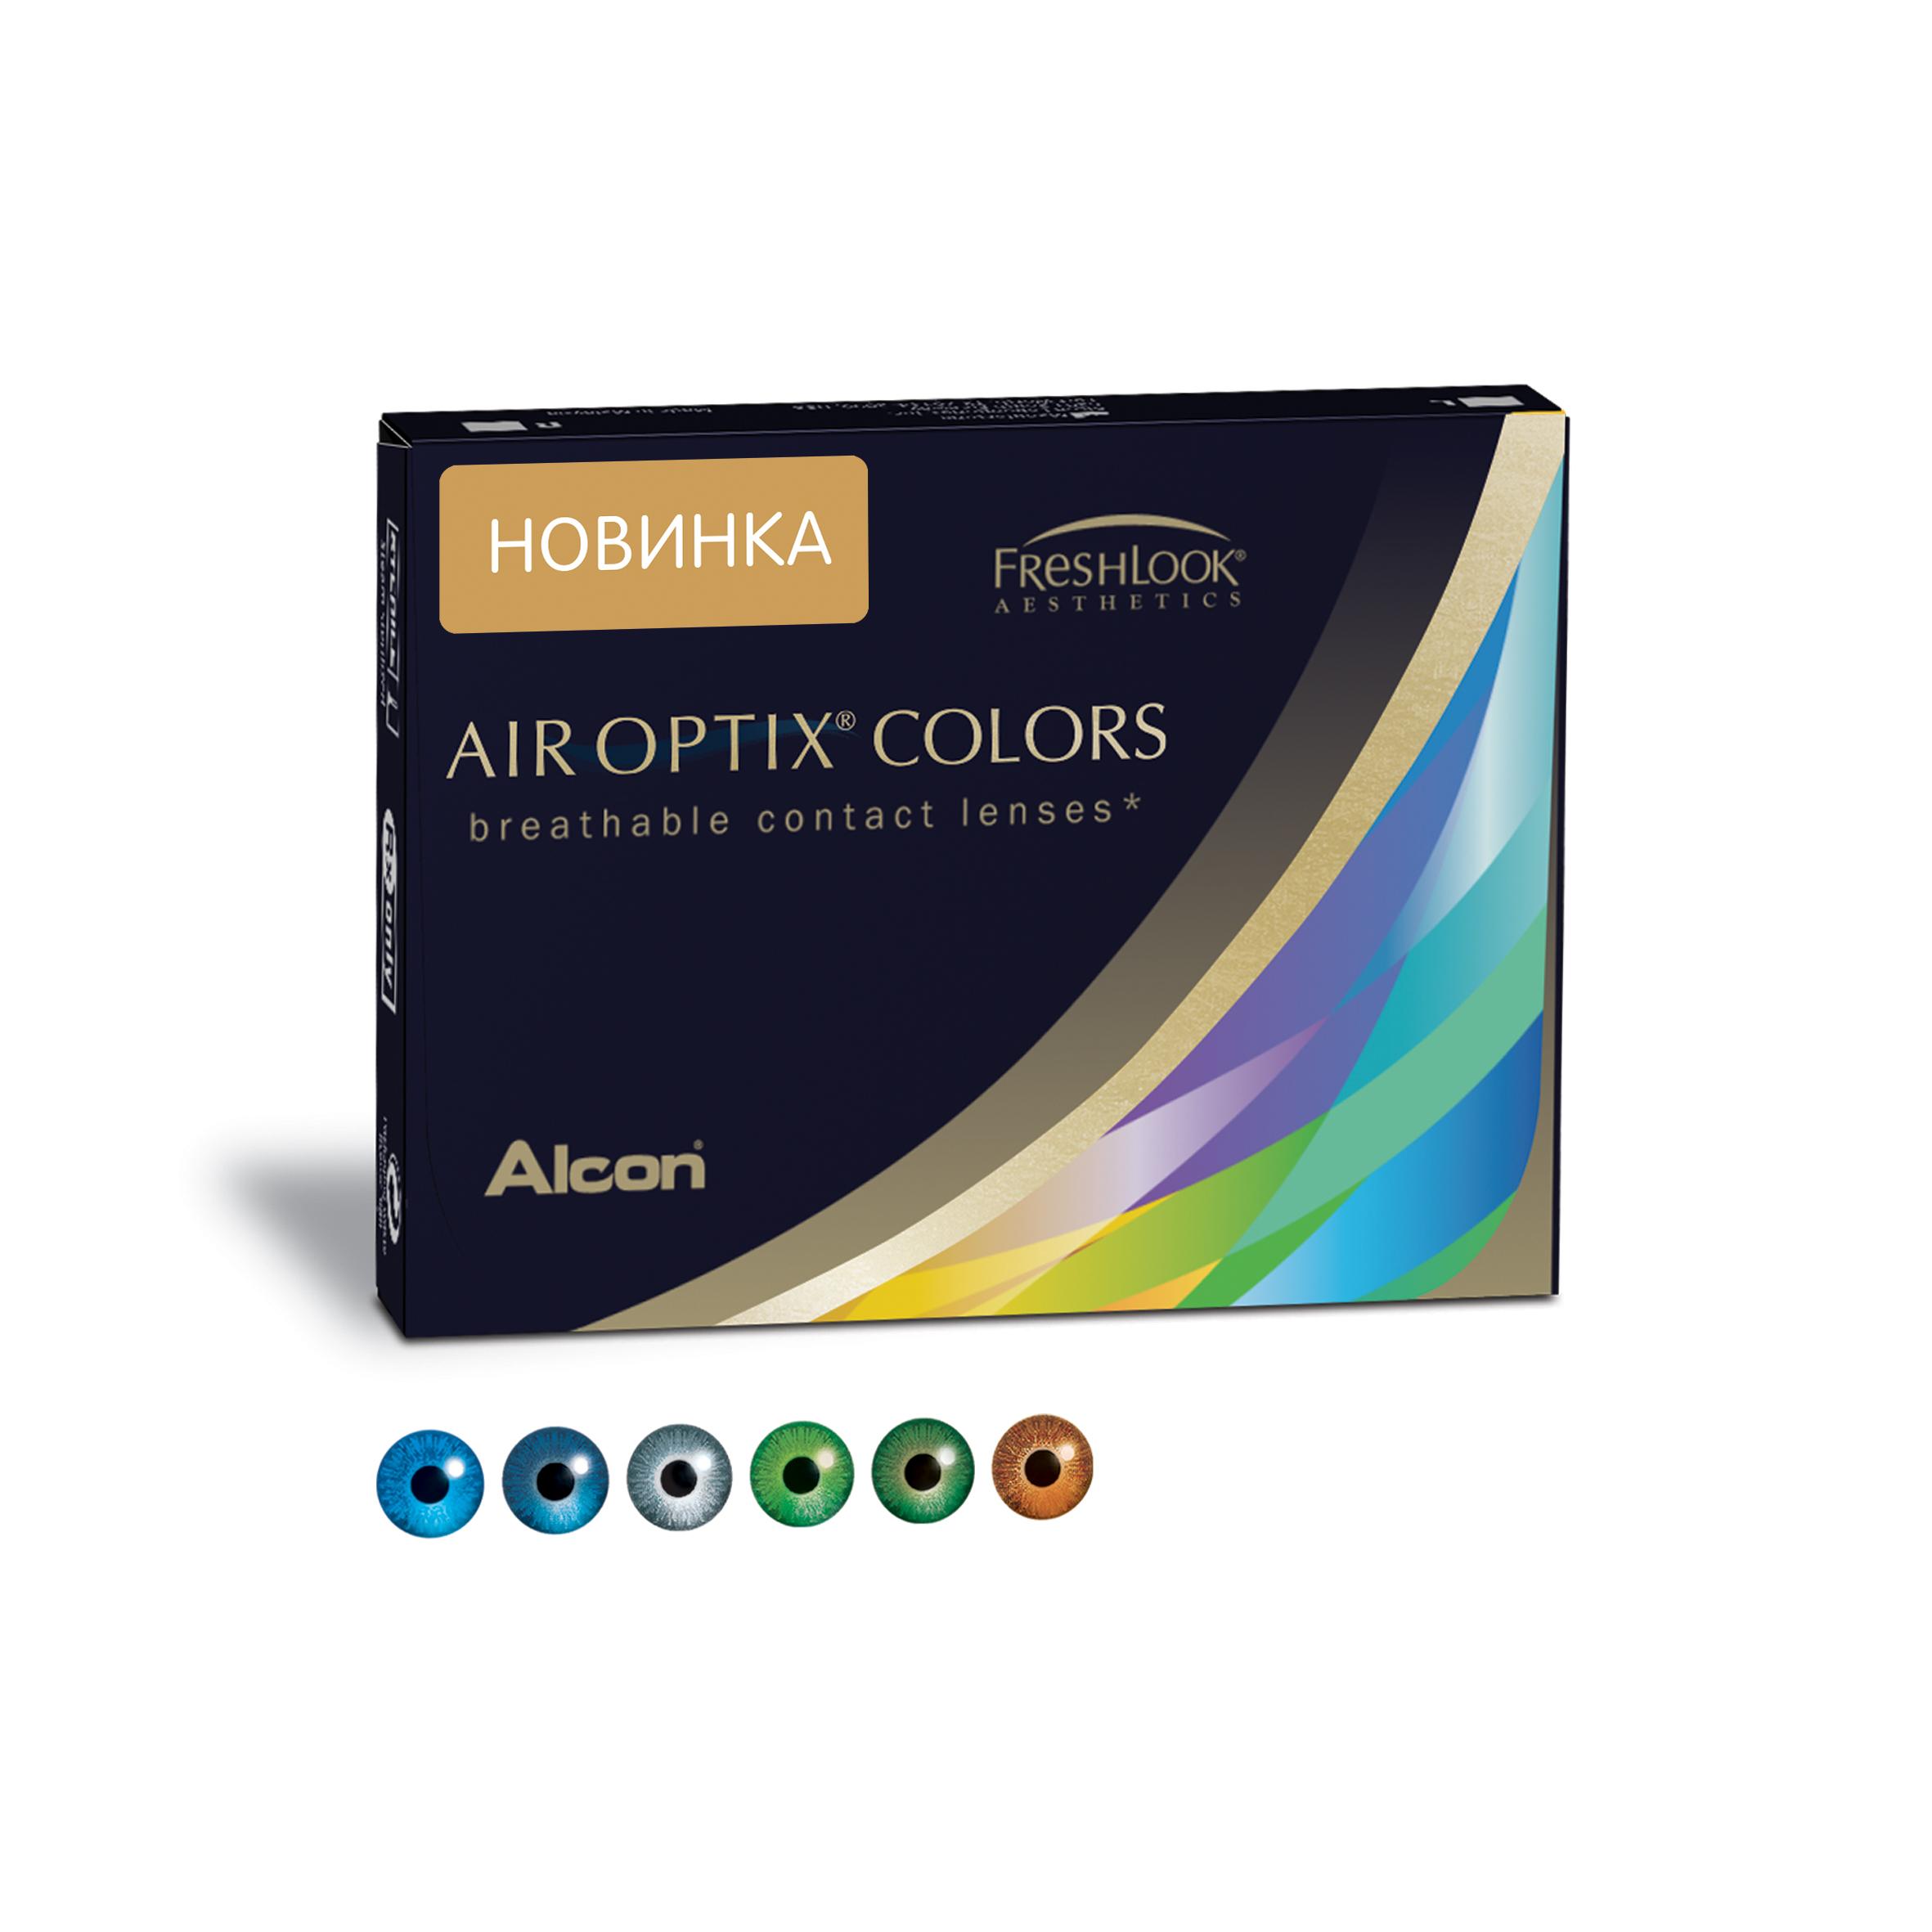 Аlcon контактные линзы Air Optix Colors 2 шт -1.00 Green31746126Мягкие контактные линзы